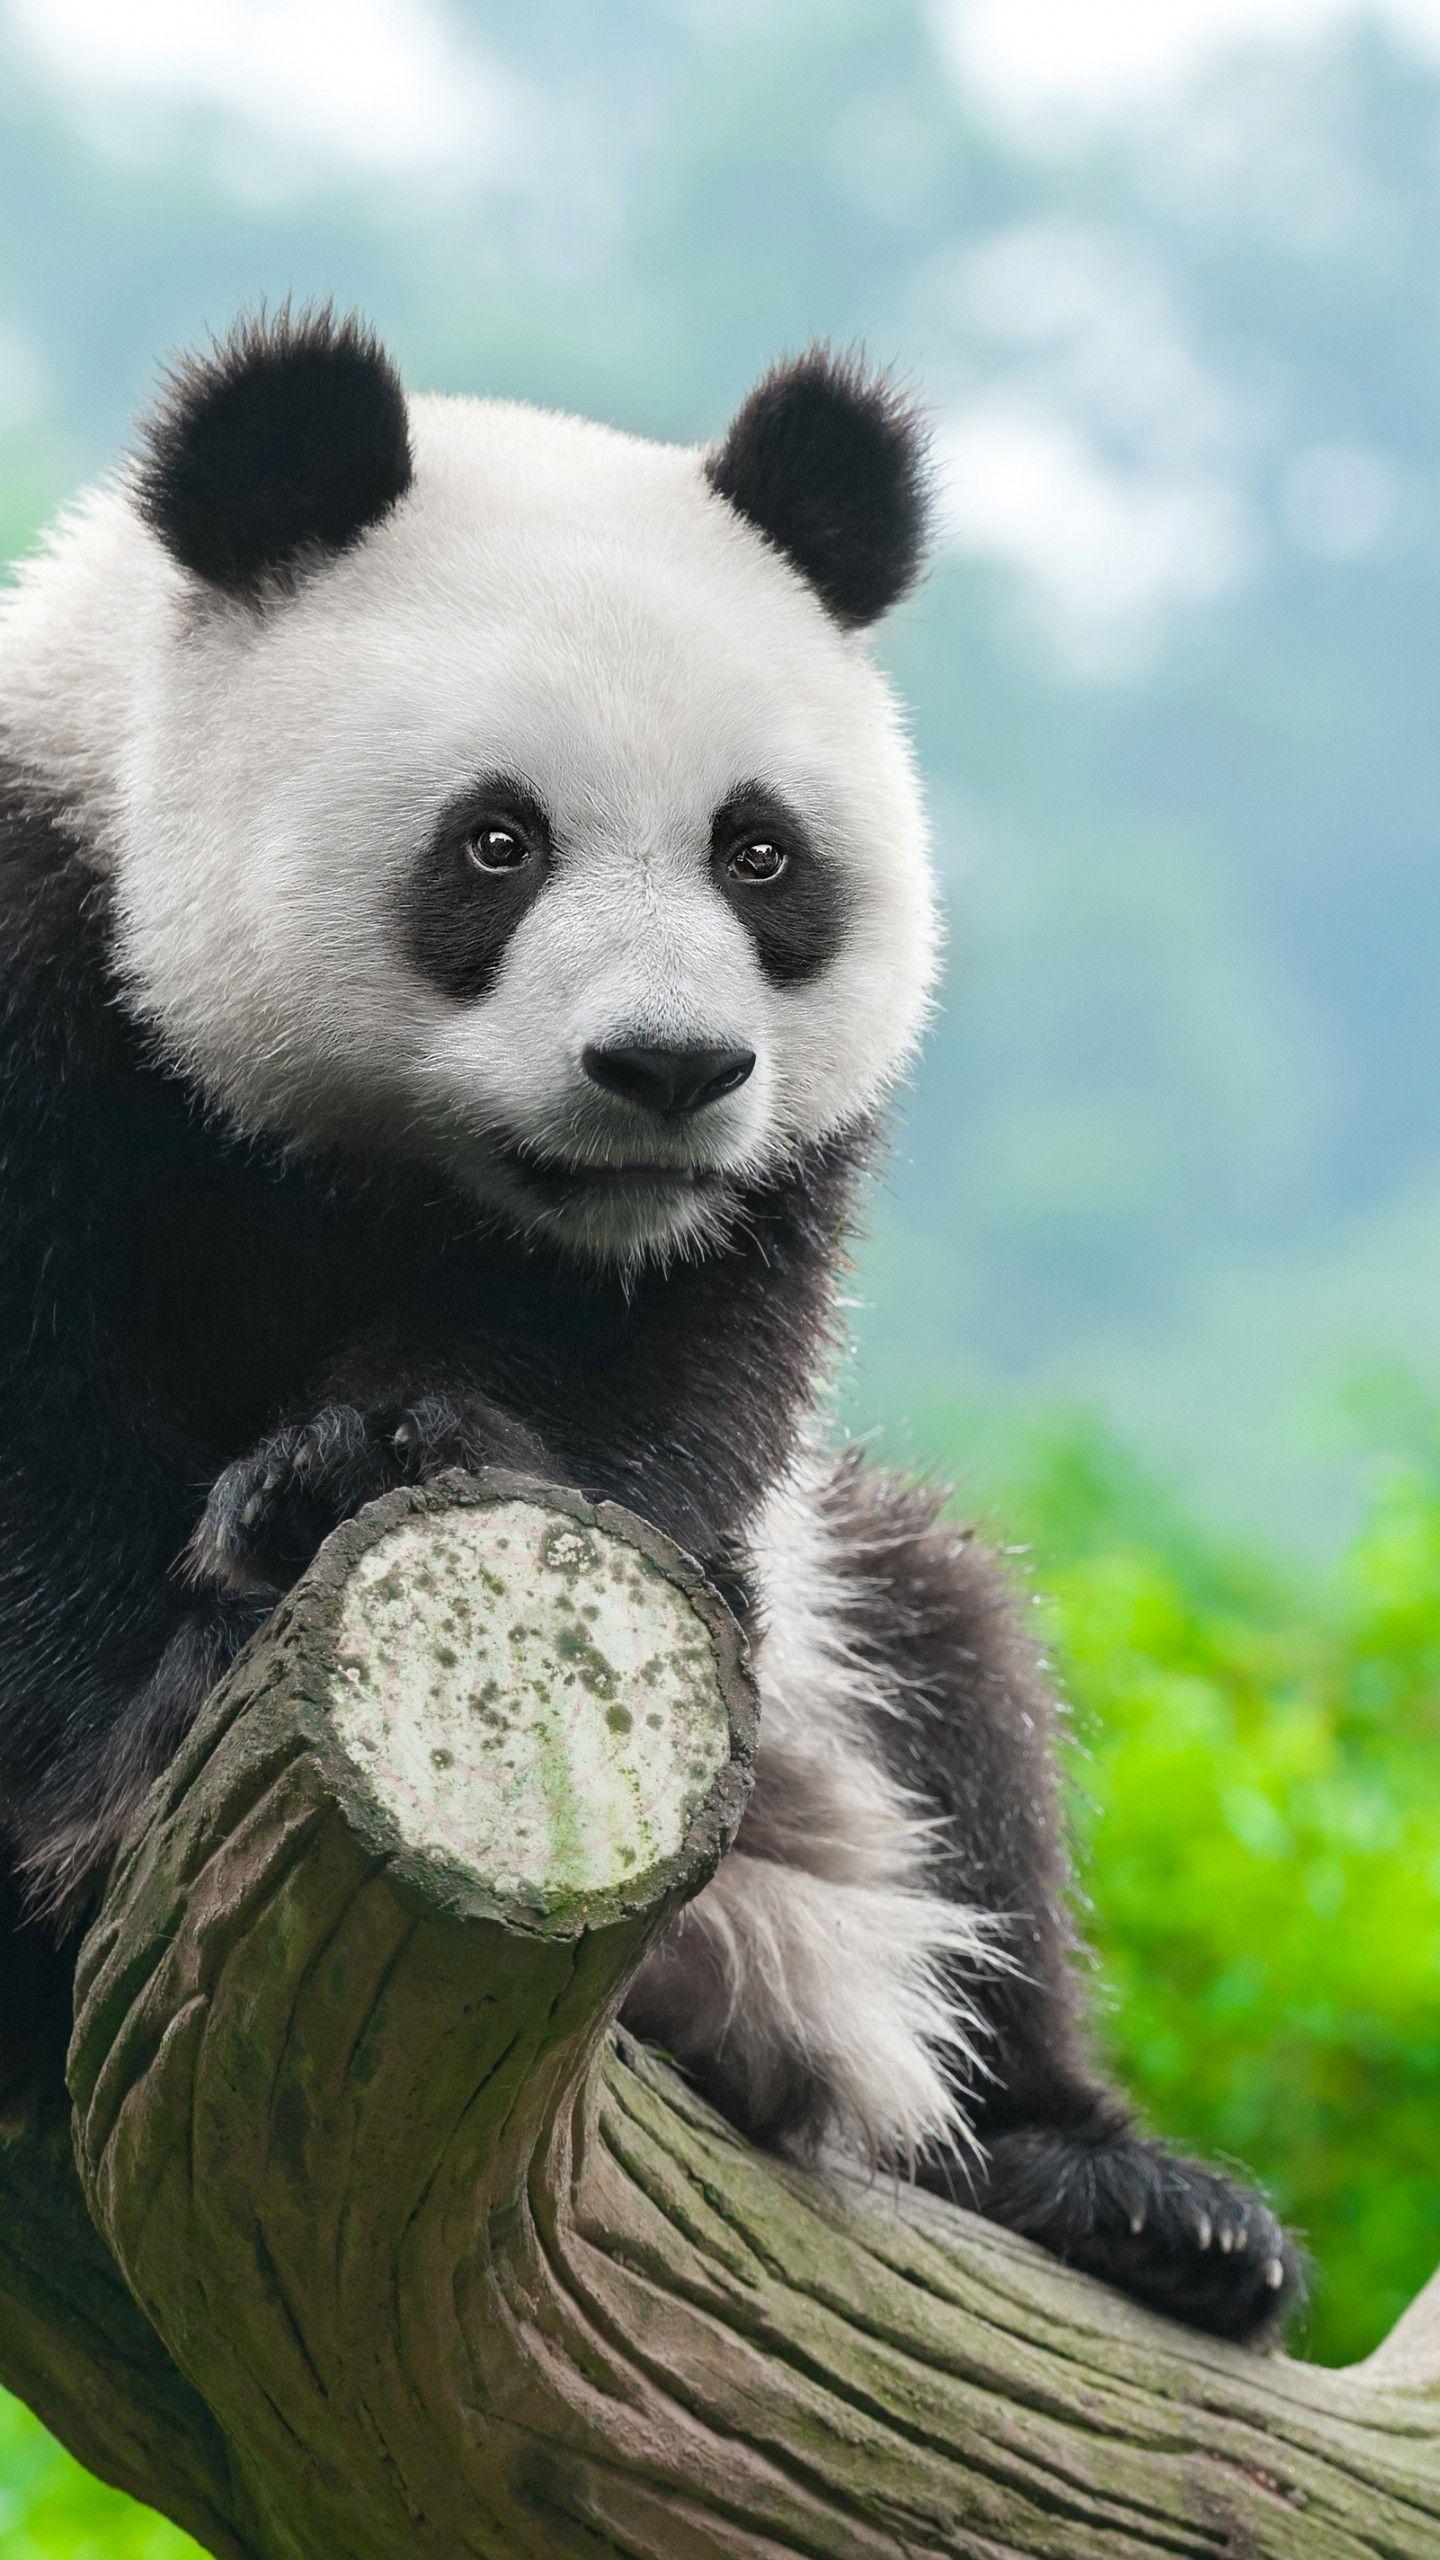 Animals Panda Wallpapers - Wallpaper Cave